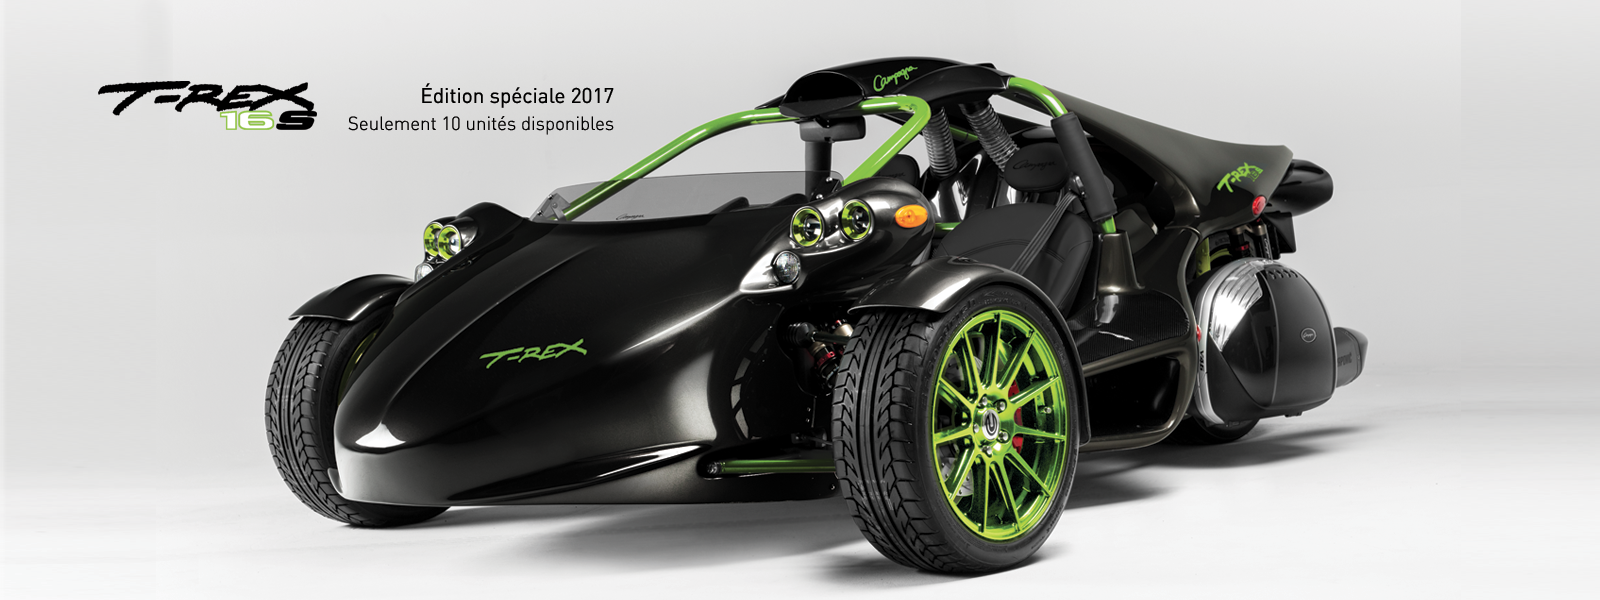 2017 T-REX 16SP Edition speciale